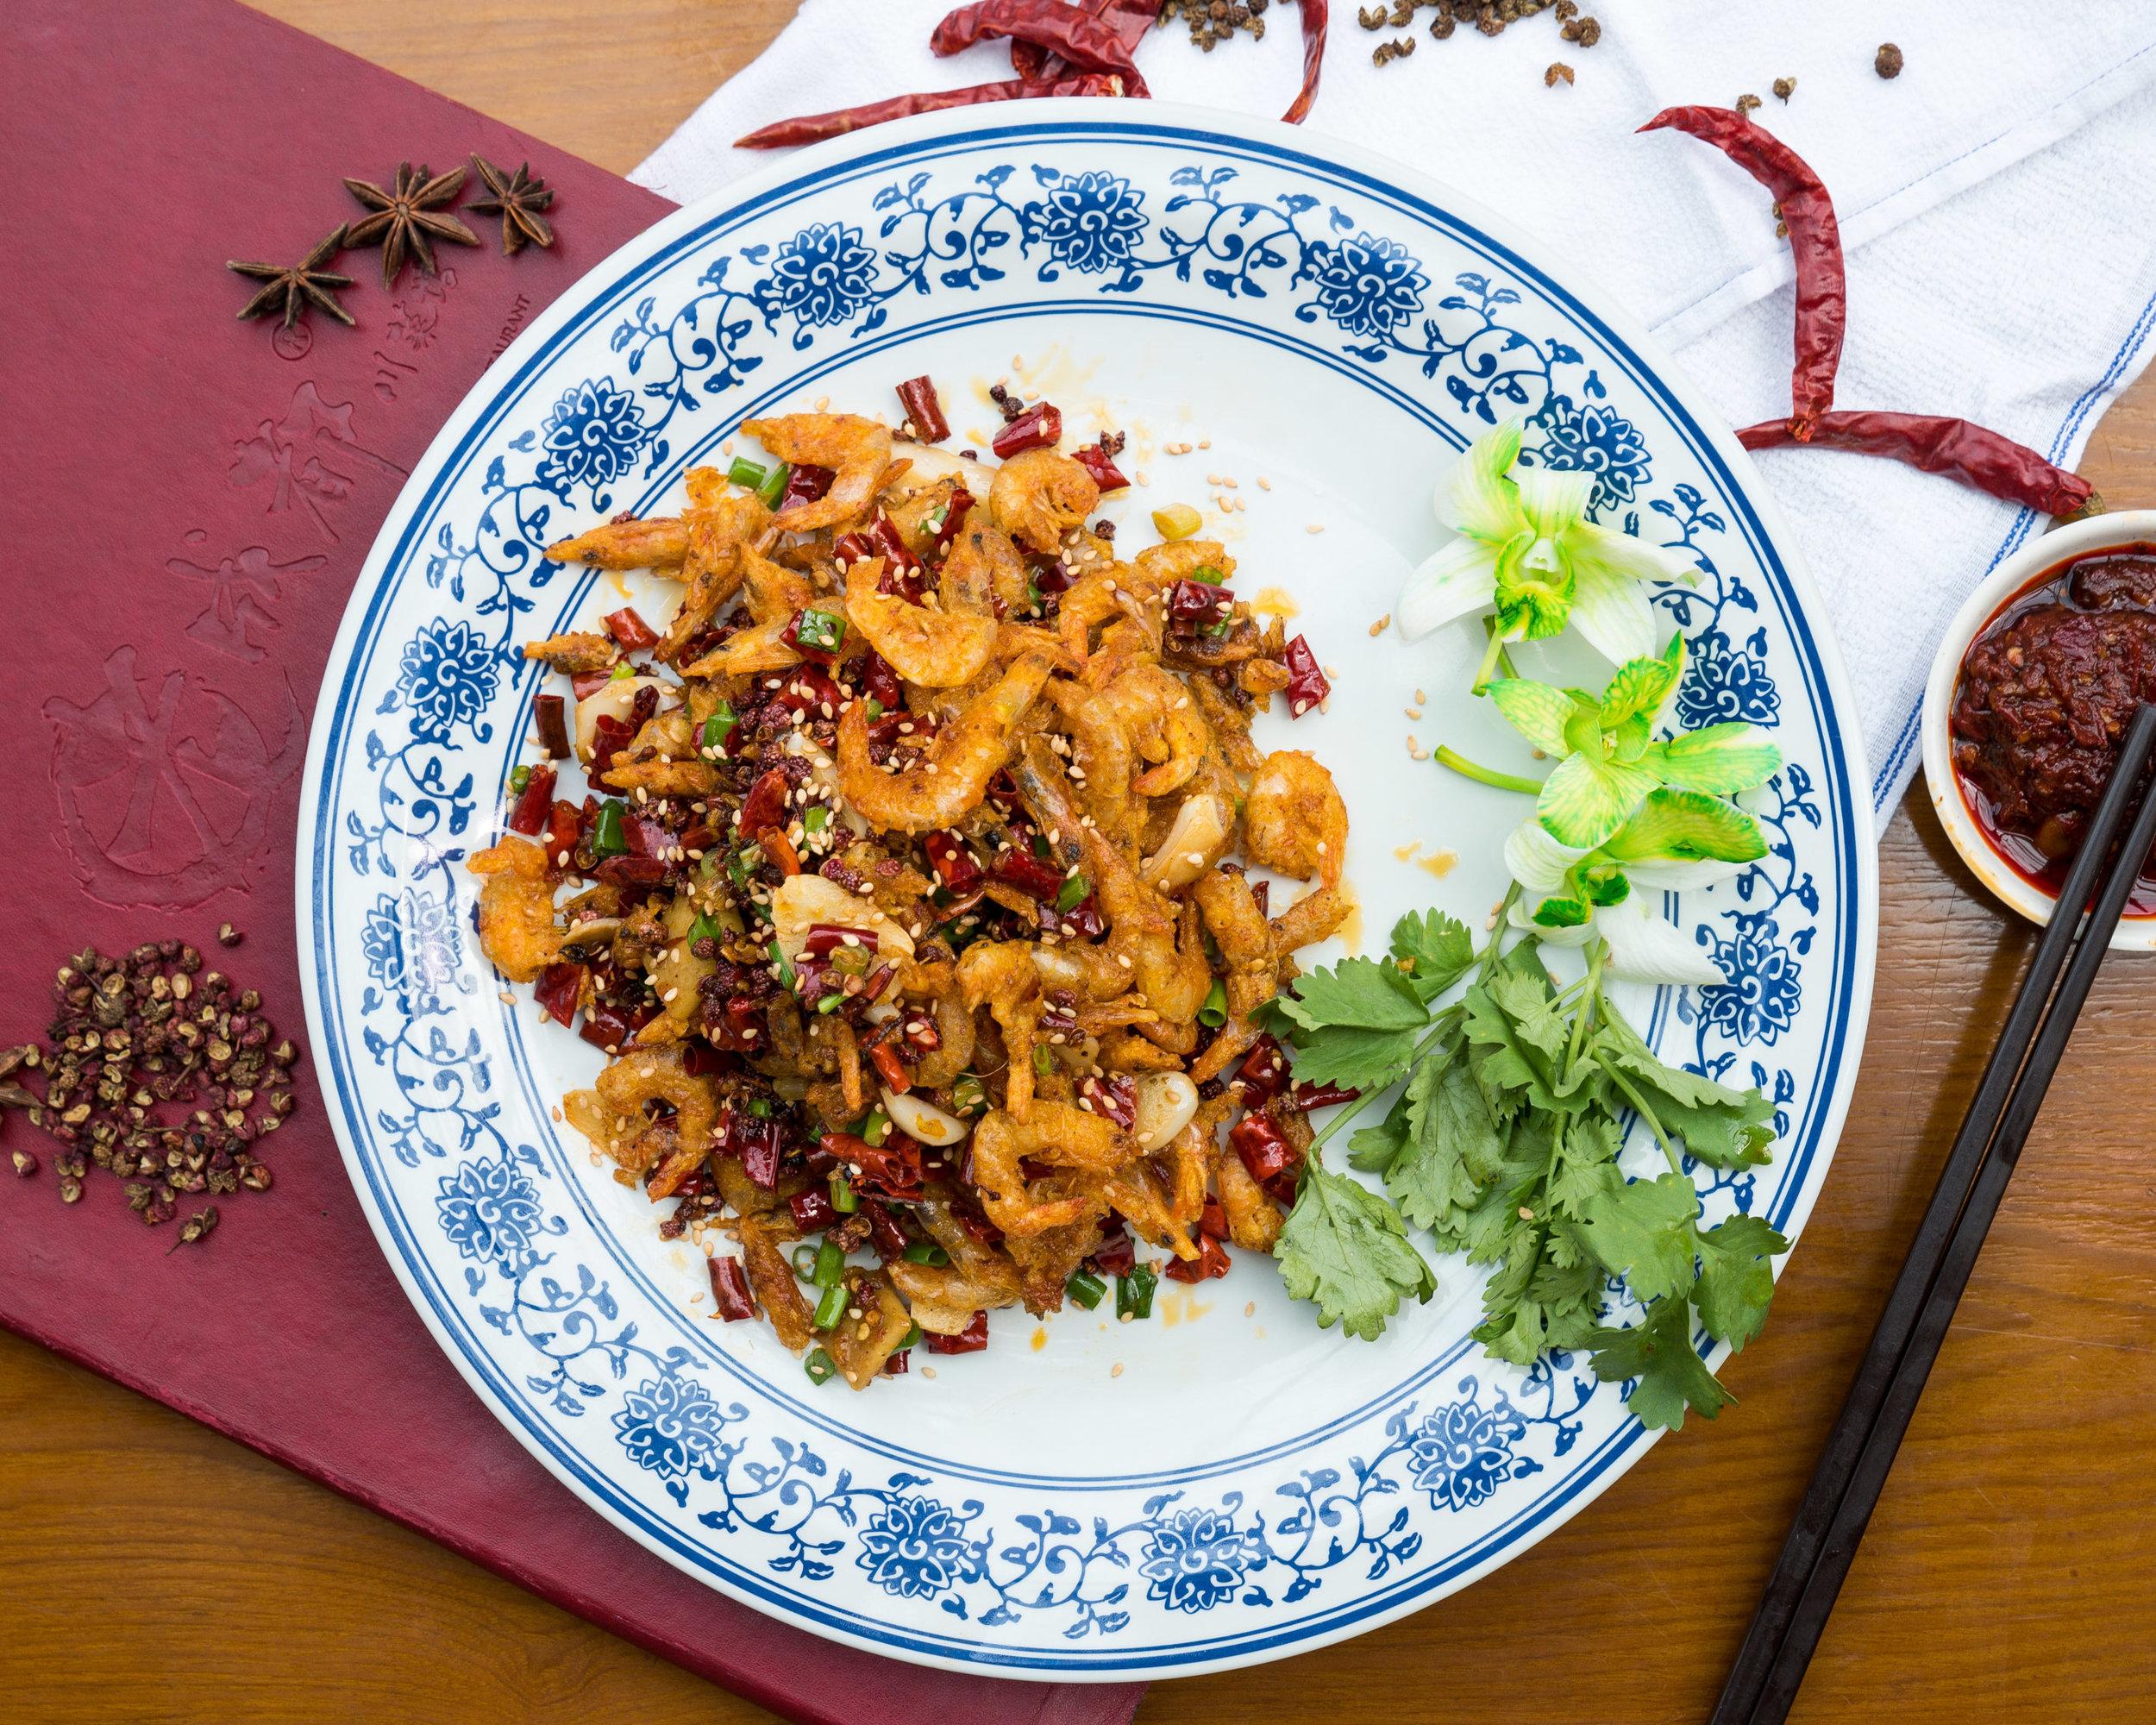 Old Chengdu Sichuan Cuisine Restaurant_Menu_2880x2304-13.jpg